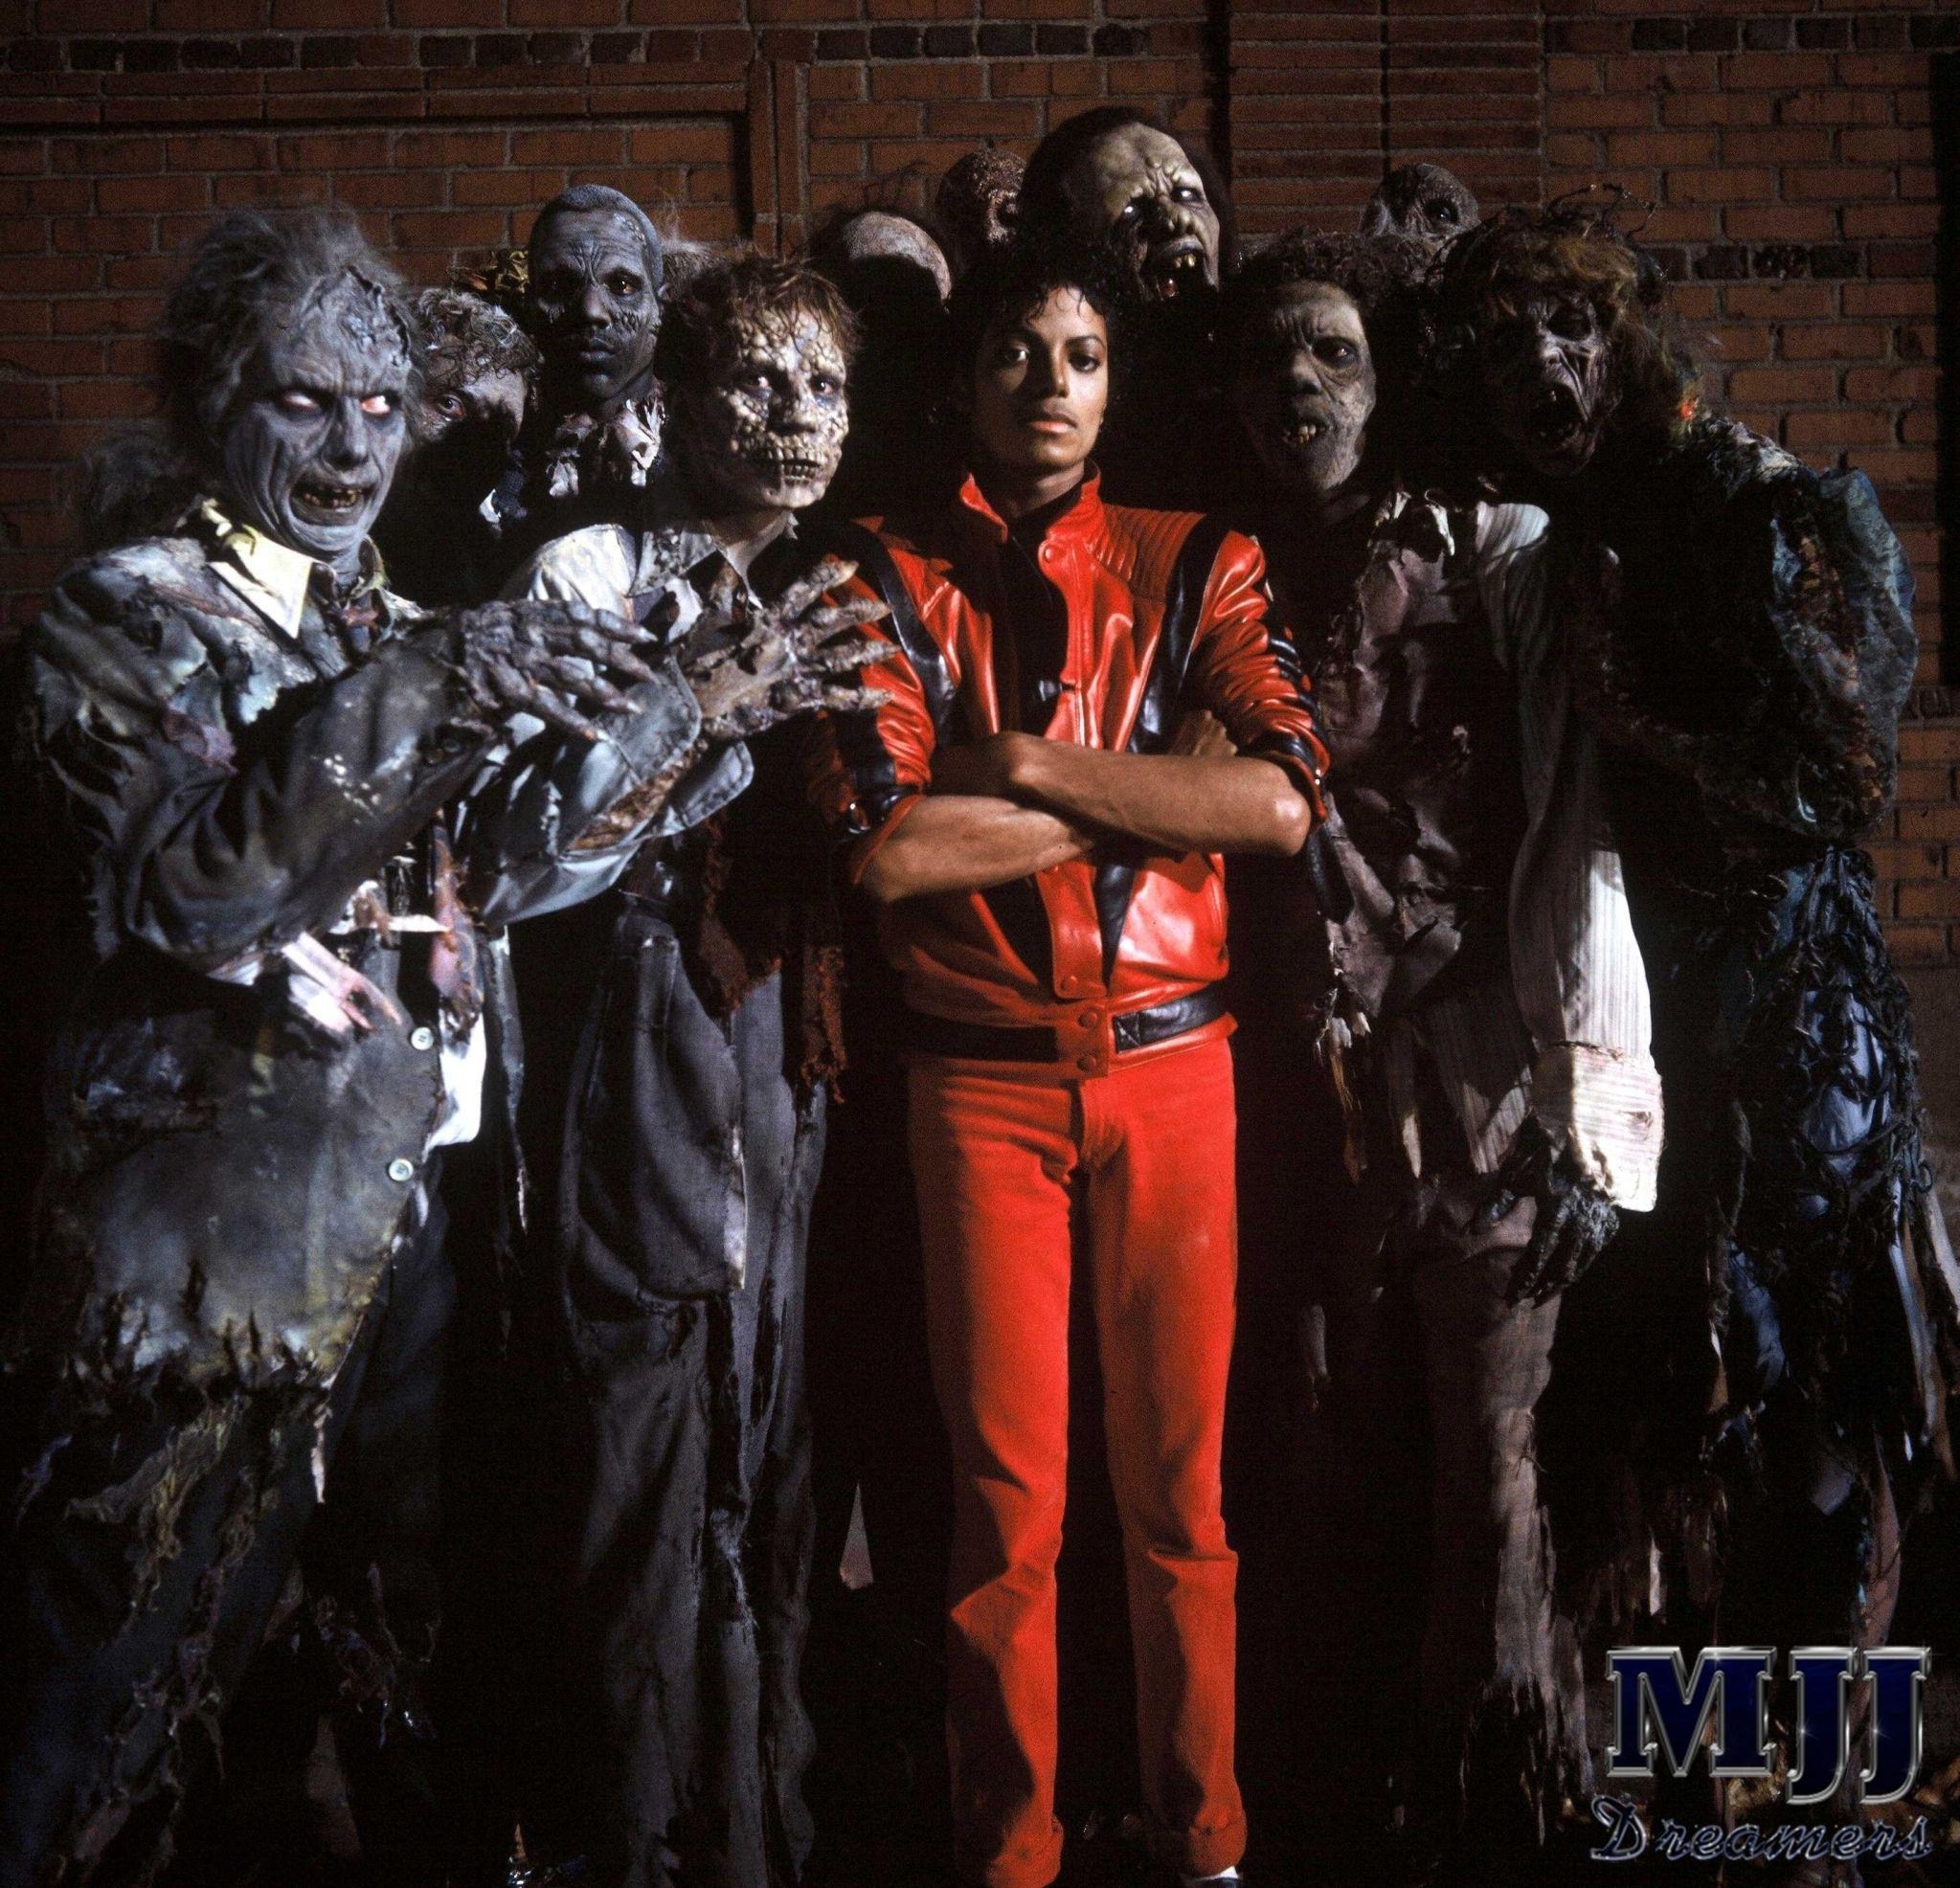 HQ The Thriller Era Photo (18989925) Fanpop michael